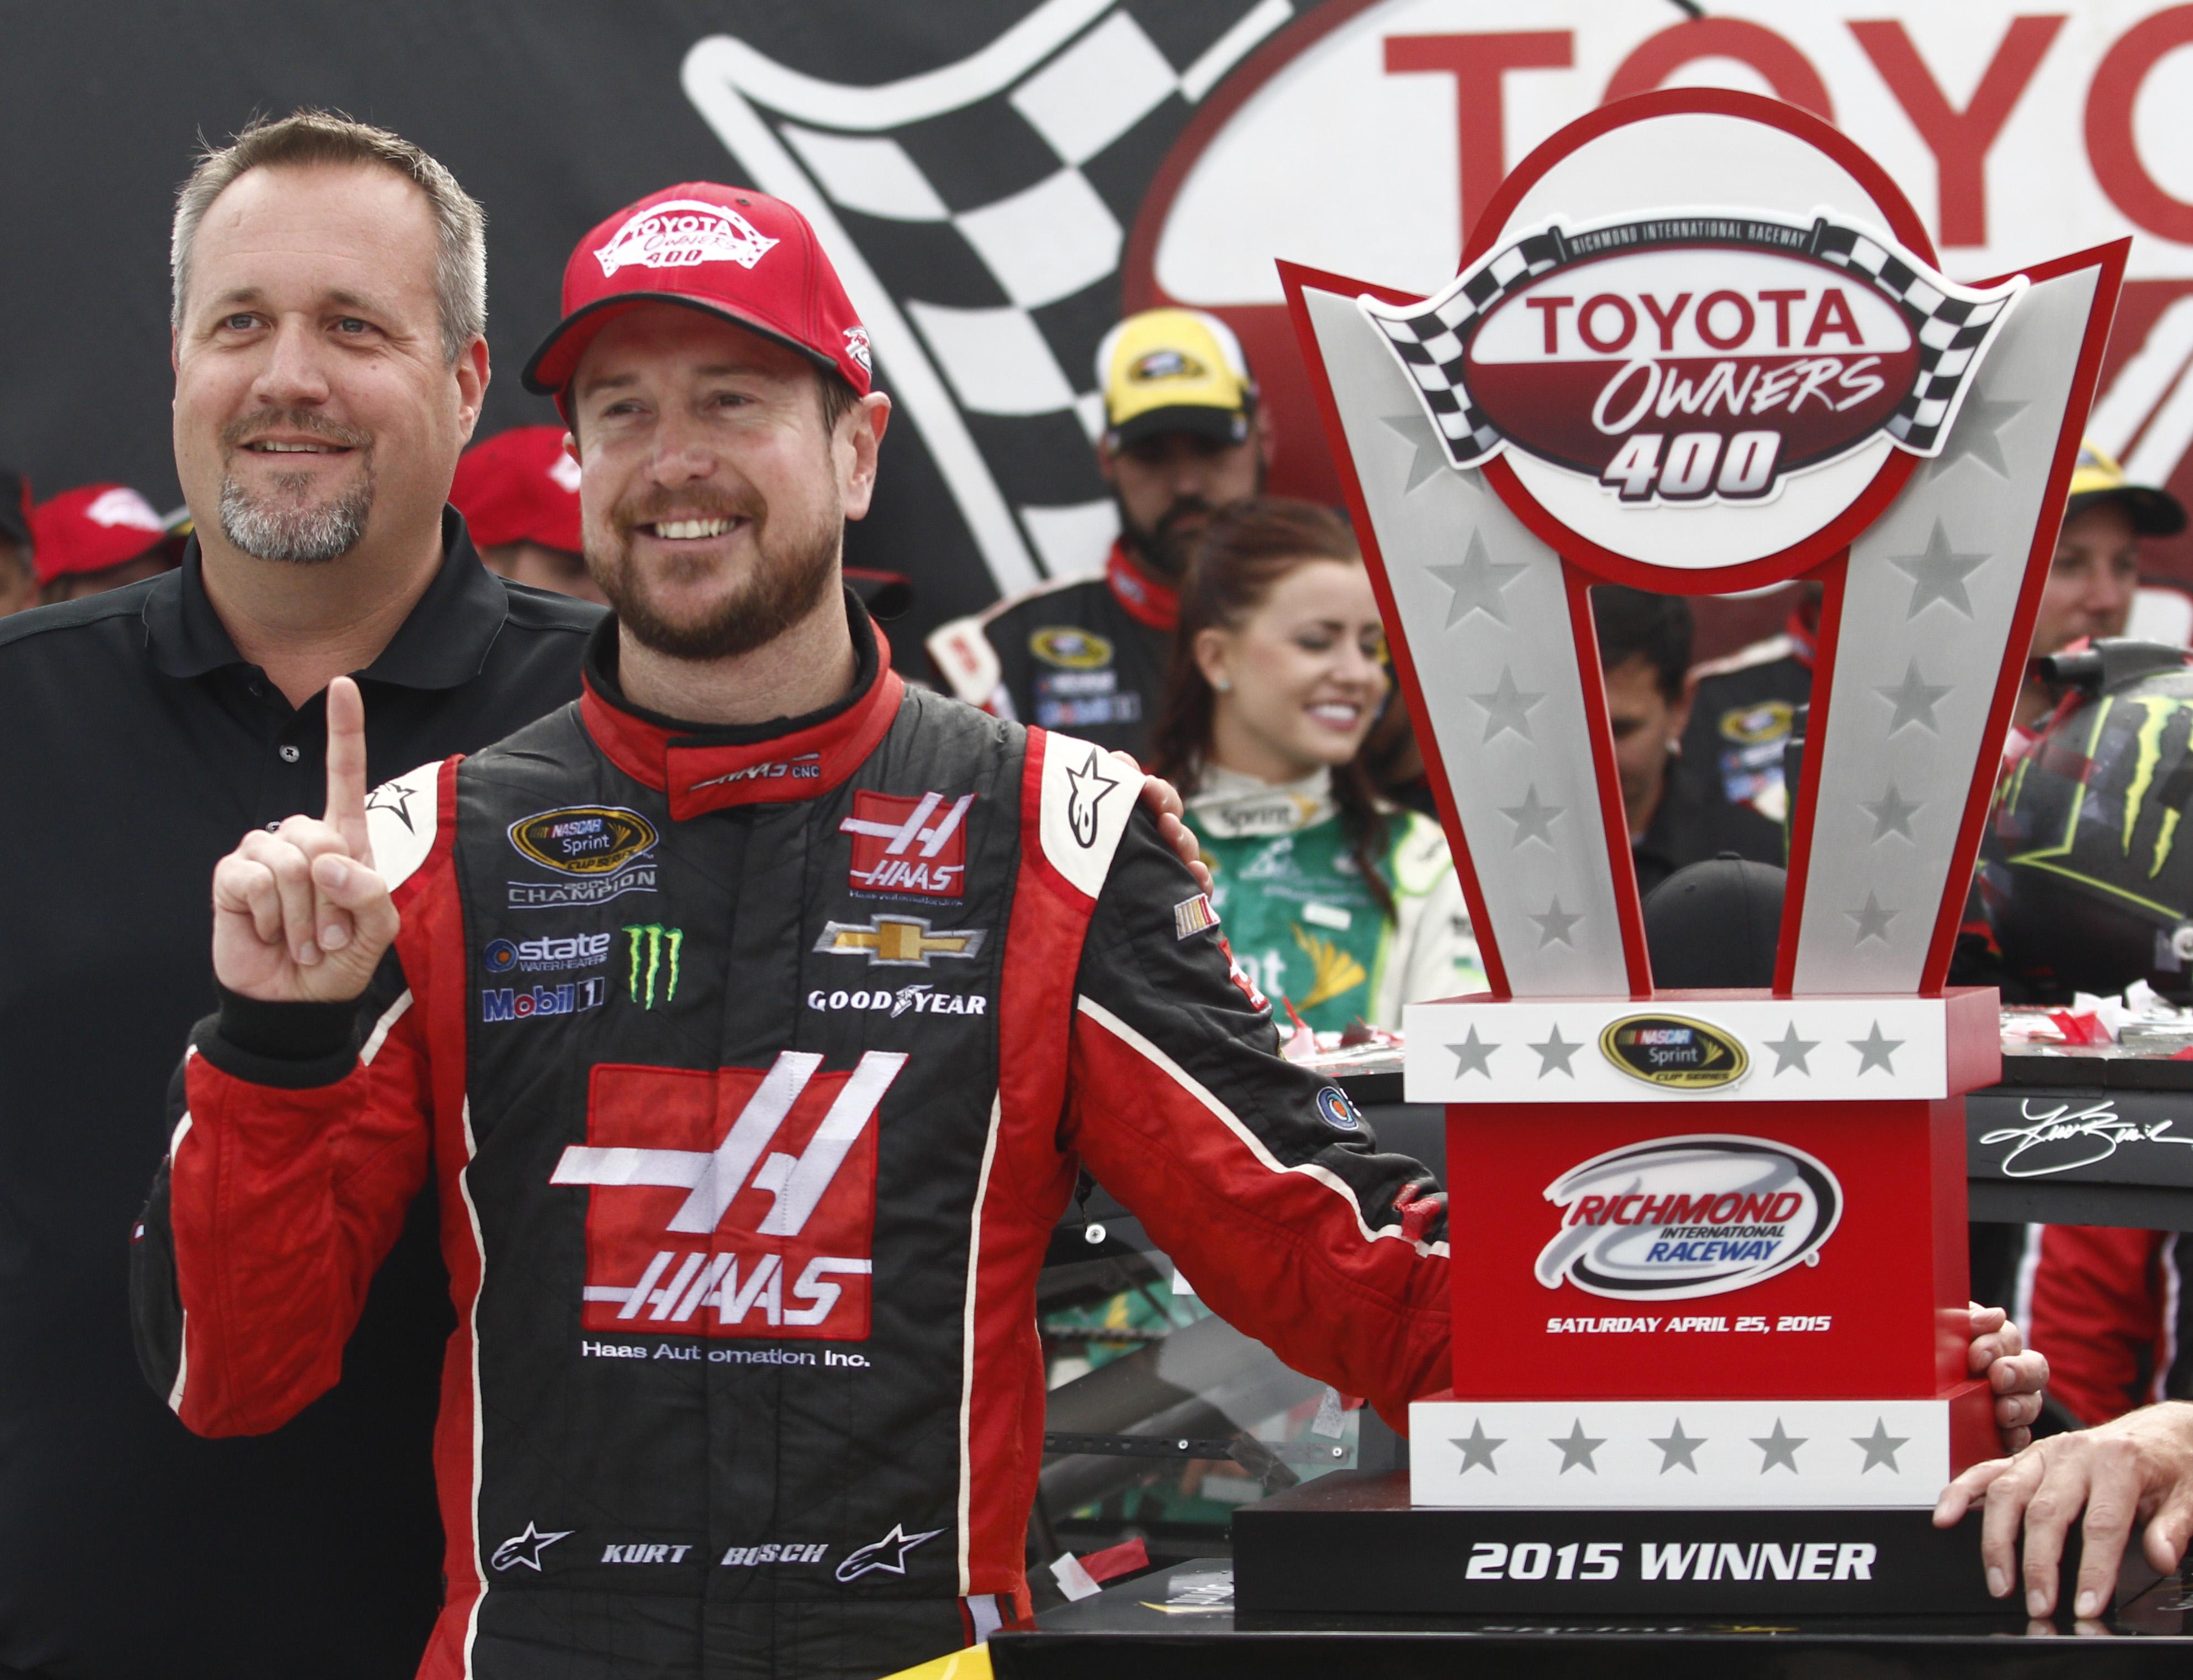 Kurt Busch, second from left, stands with the trophy after winning the NASCAR Sprint Cup auto race at Richmond International Raceway in Richmond, Va., Sunday, April 26, 2015. (AP Photo/Scott P. Yates)